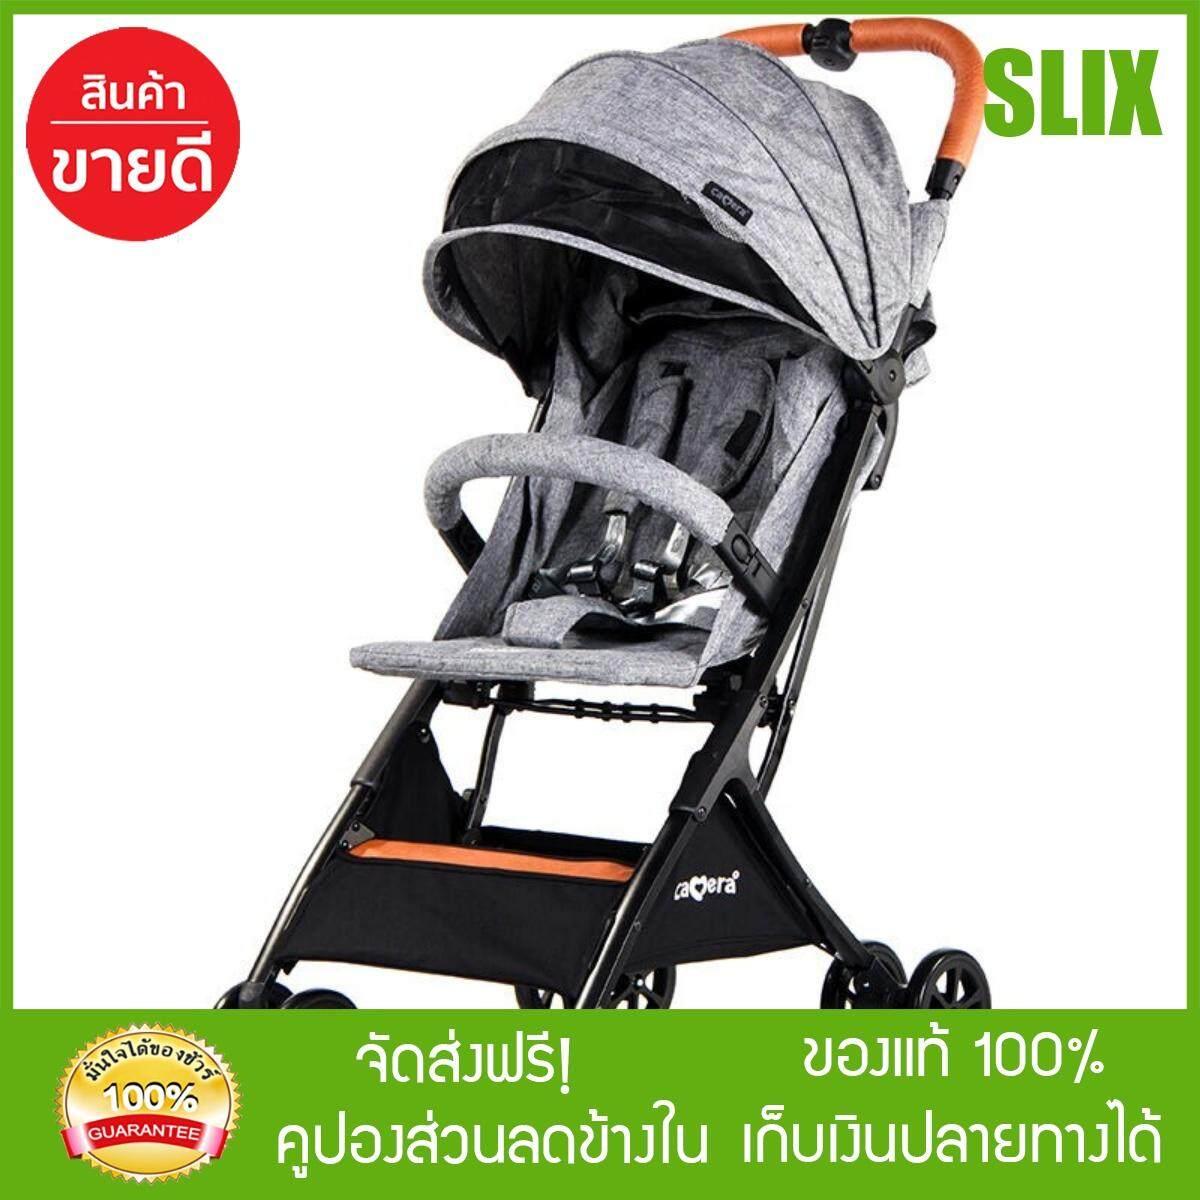 [Slix]- CAMERA รถเข็นนอนราบด้ามจับหนัง Boolet LT 26*29*53=108 cm. เทา+กระเป๋า รถเข็นเด็ก รถเข็นเด็กอ่อน รถเข็นเด้ก ส่ง Kerry เก็บปลายทางได้